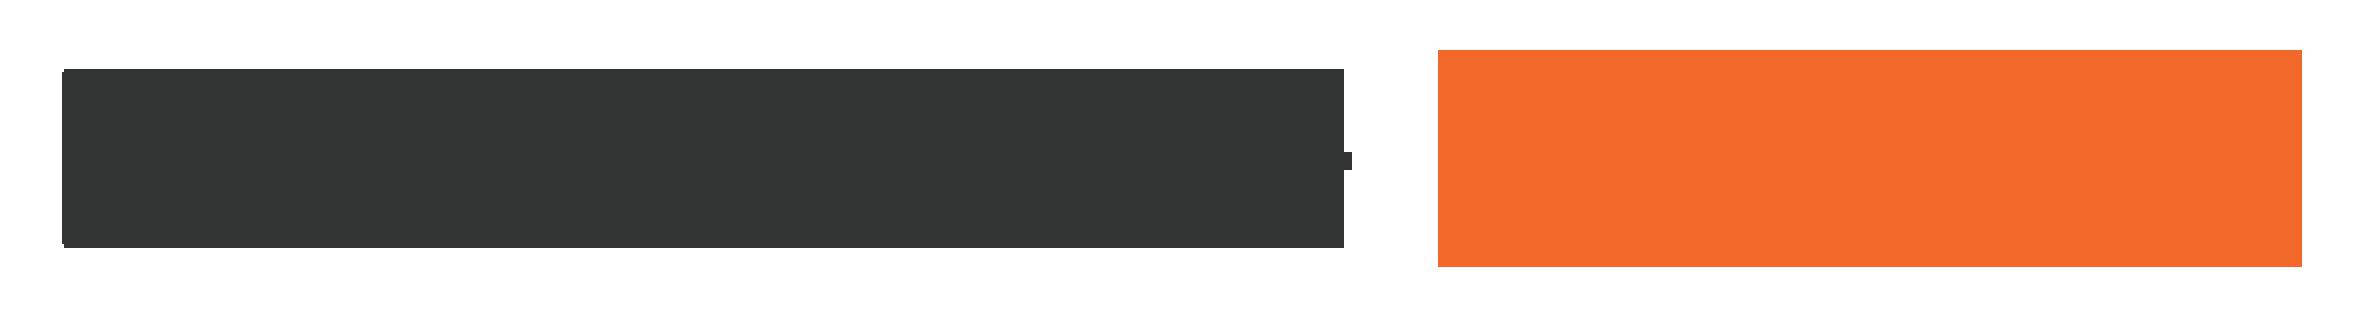 Playlister and Orange Curriculum logo